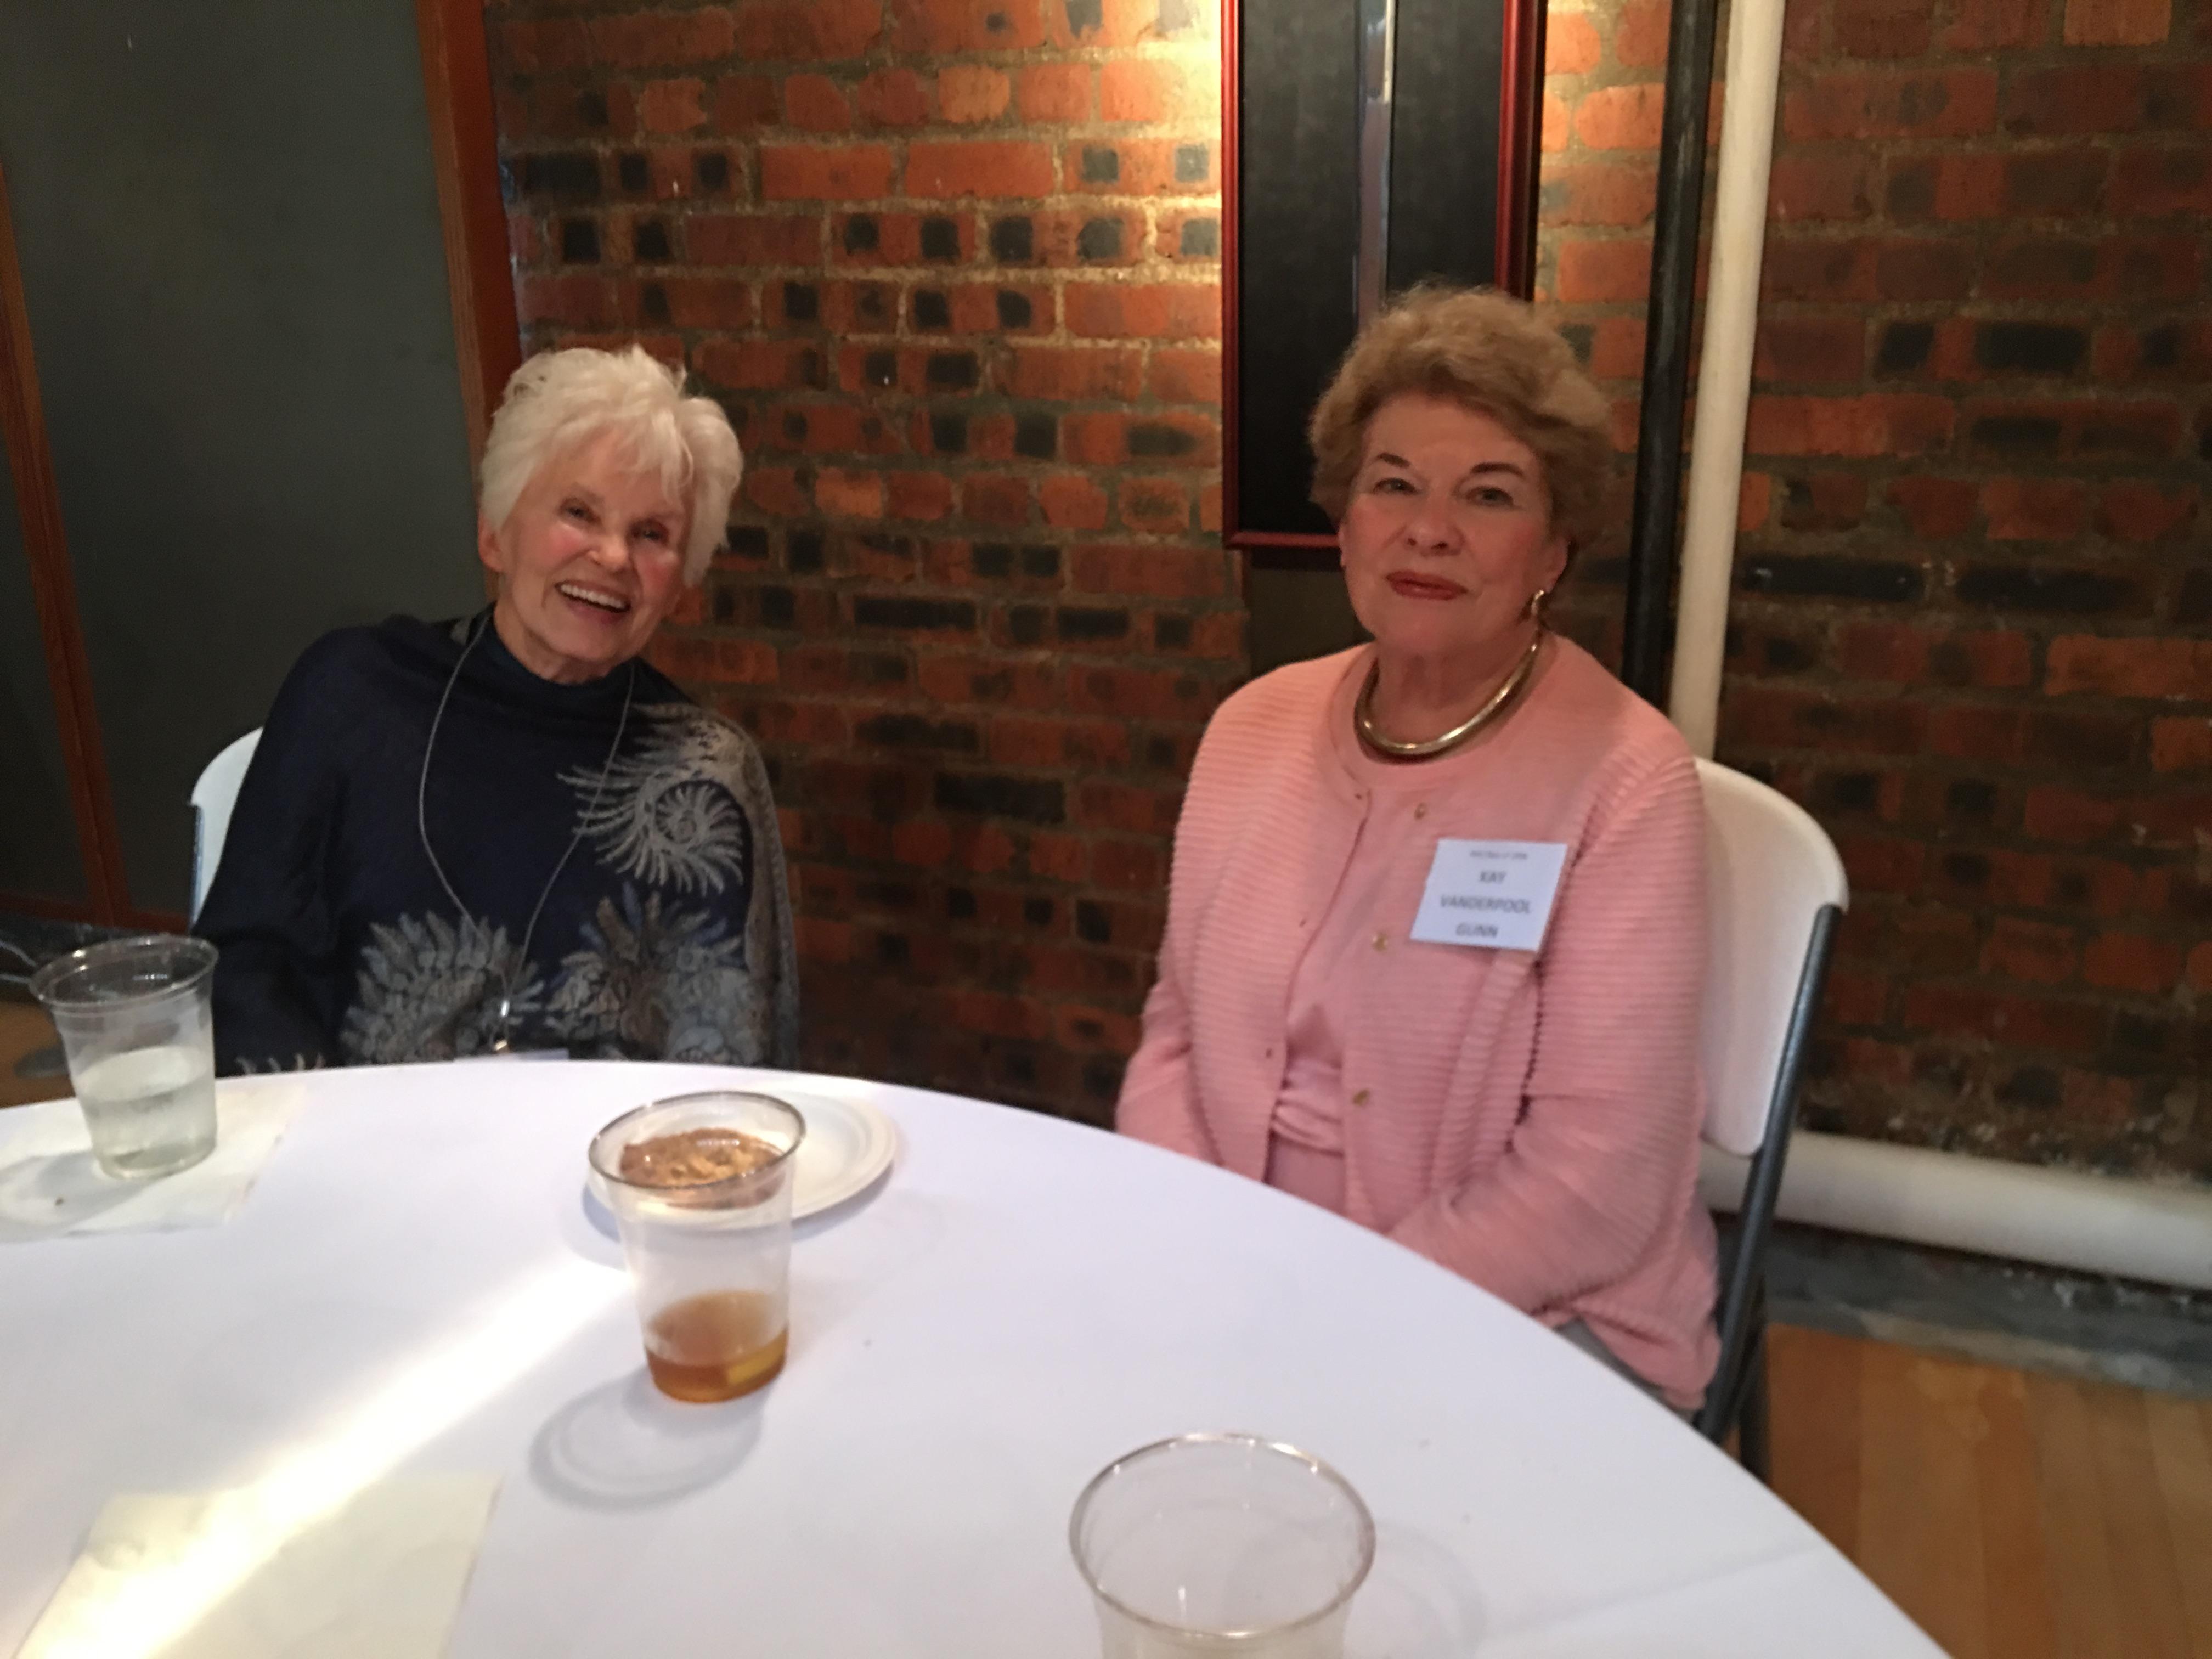 Judy Goold Shotwell and Kay Vanderpool Gunn